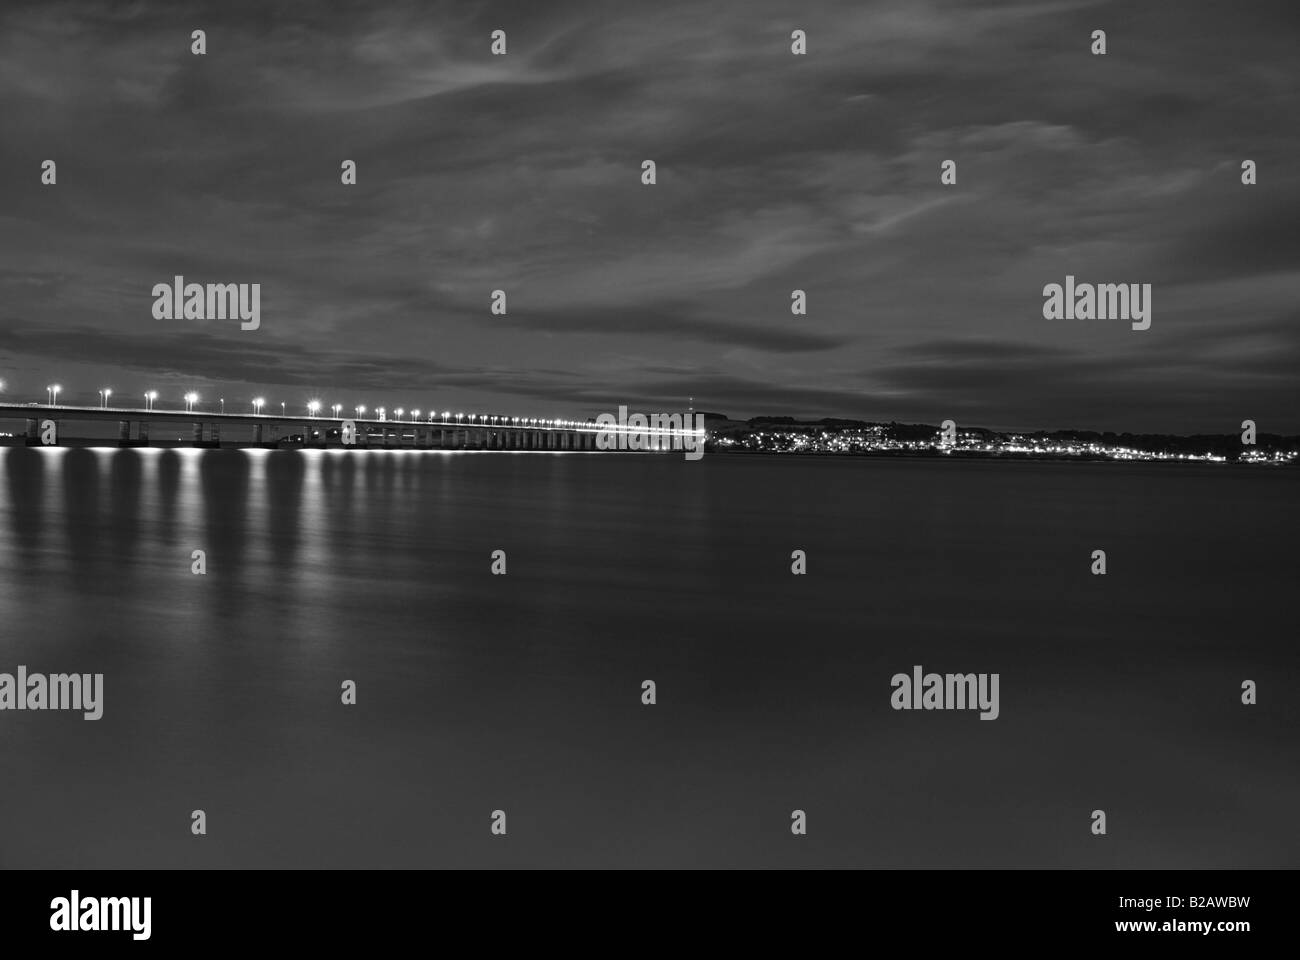 Tayroad bridge dundee night shot - Stock Image